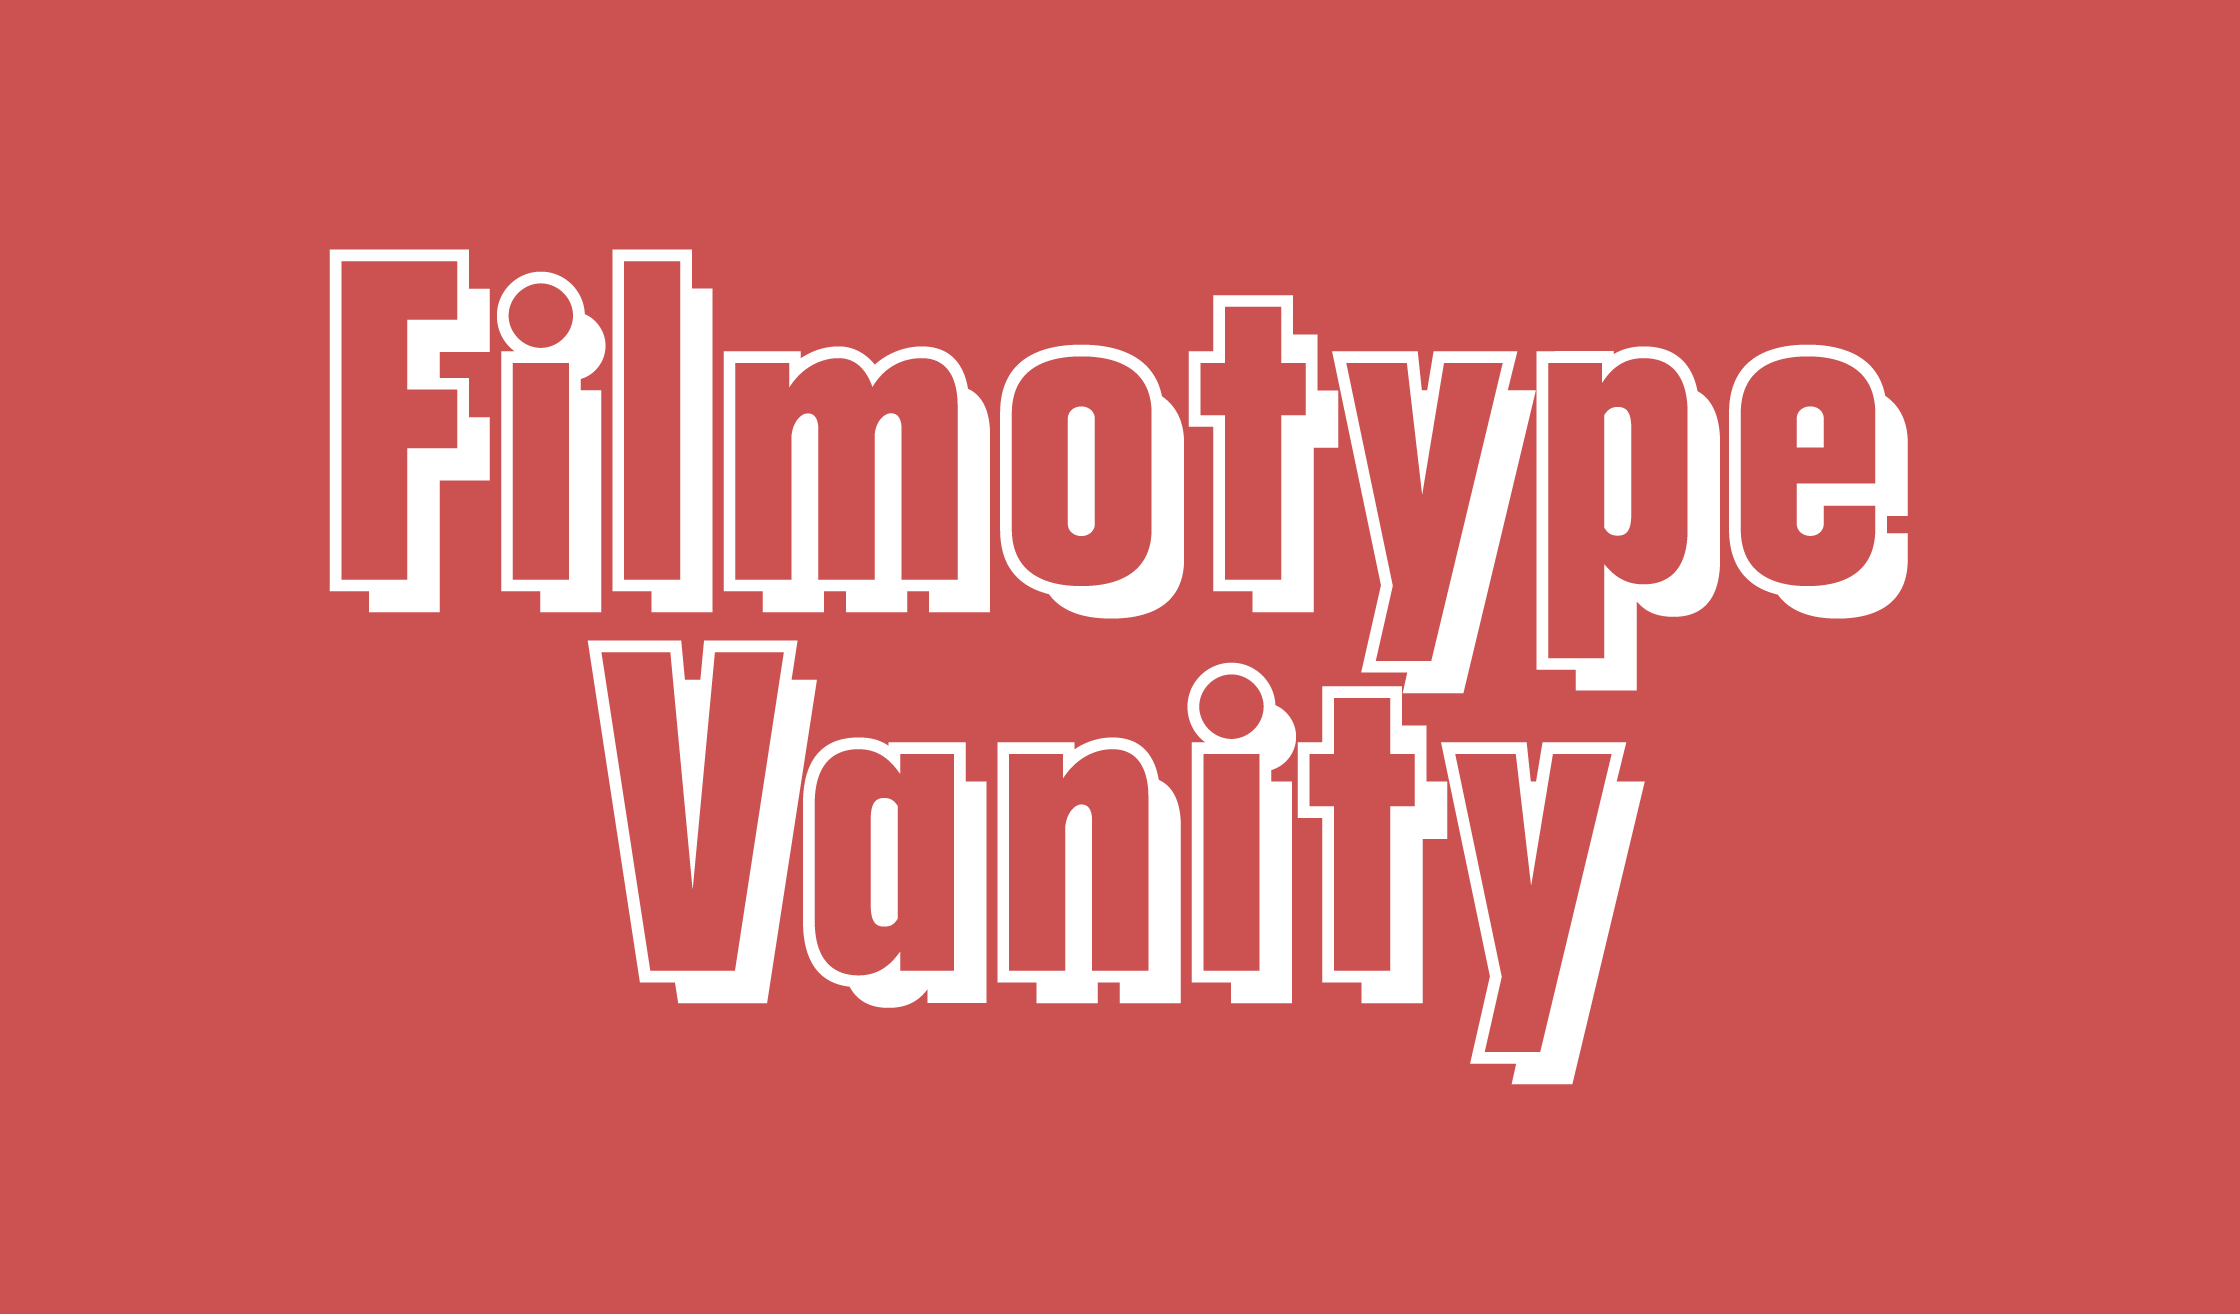 Filmotype Vanity Banner Name 2240